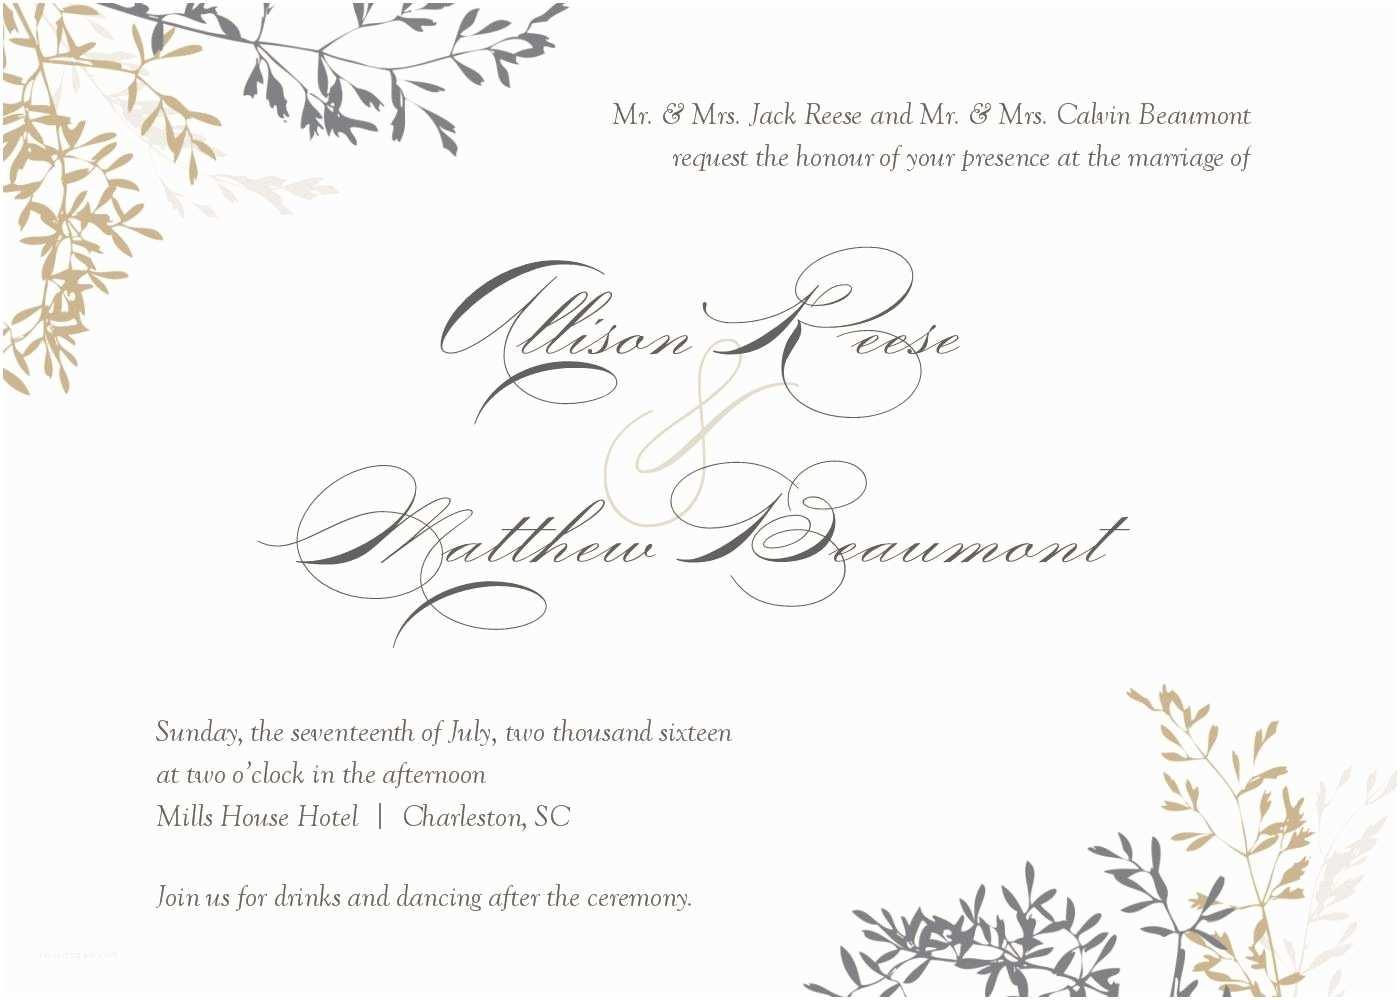 Wedding Invitation Free Download Wedding Invitation Wedding Invitations Template Superb